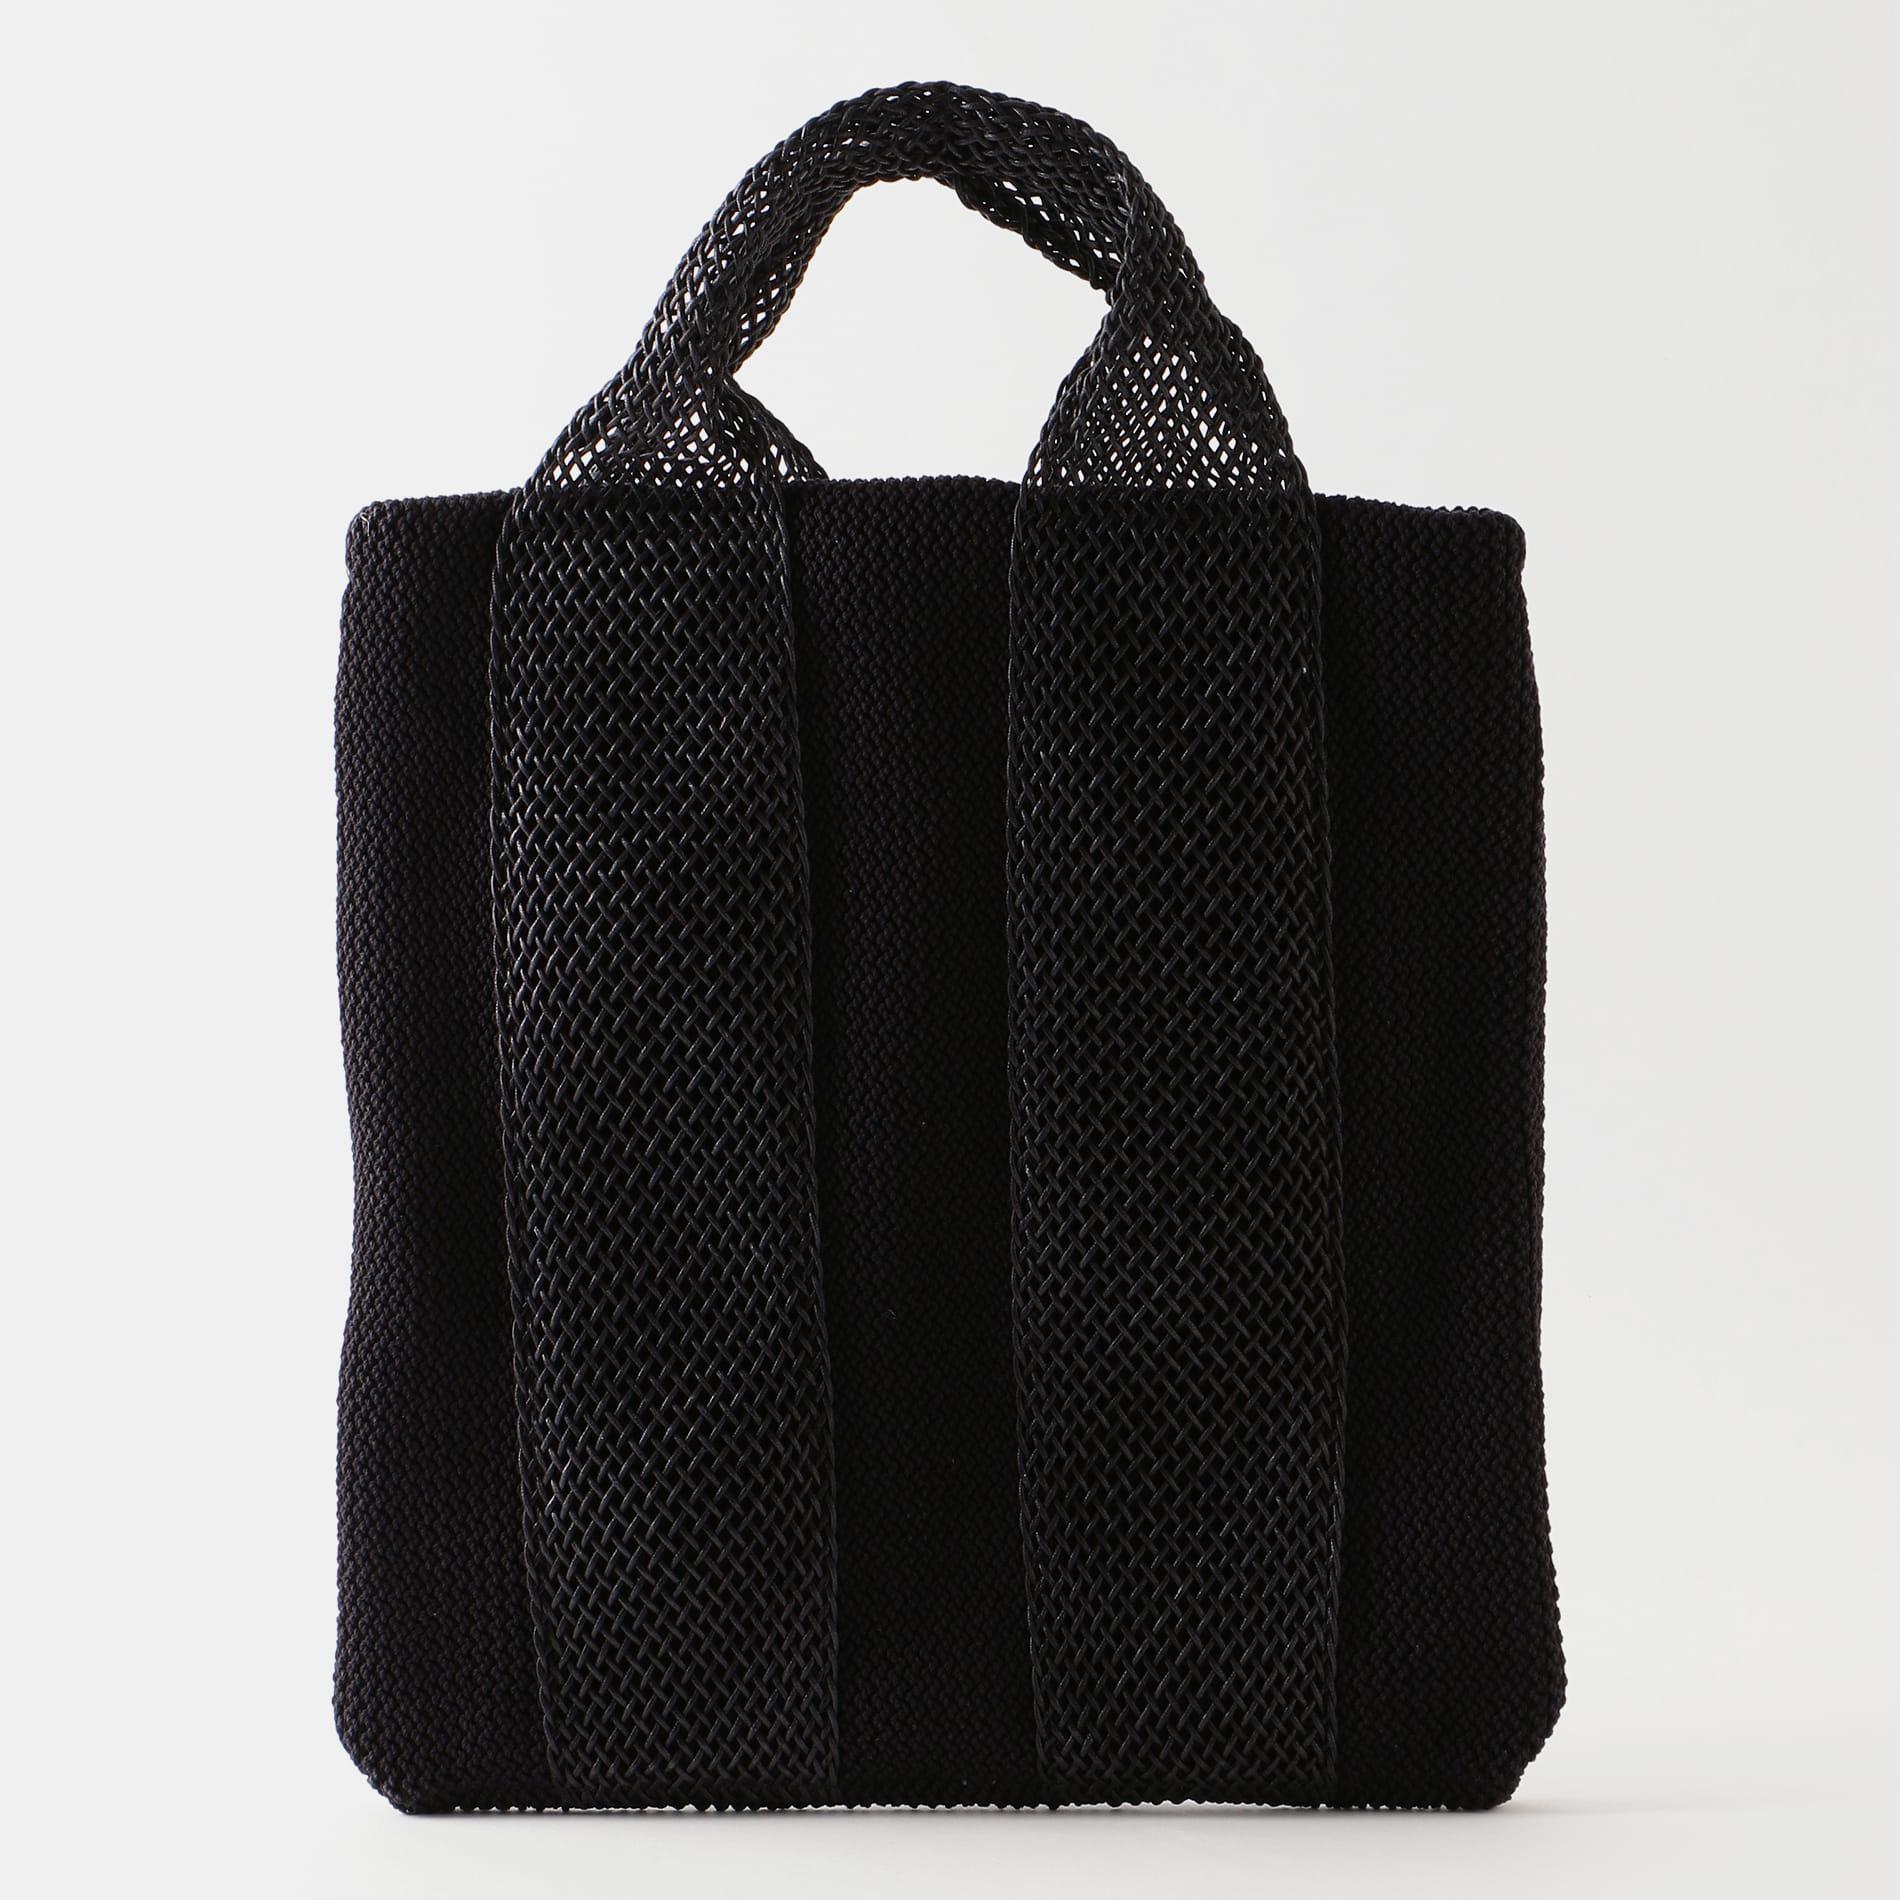 【AL】WOMEN HAND BAG AL0124BG-02